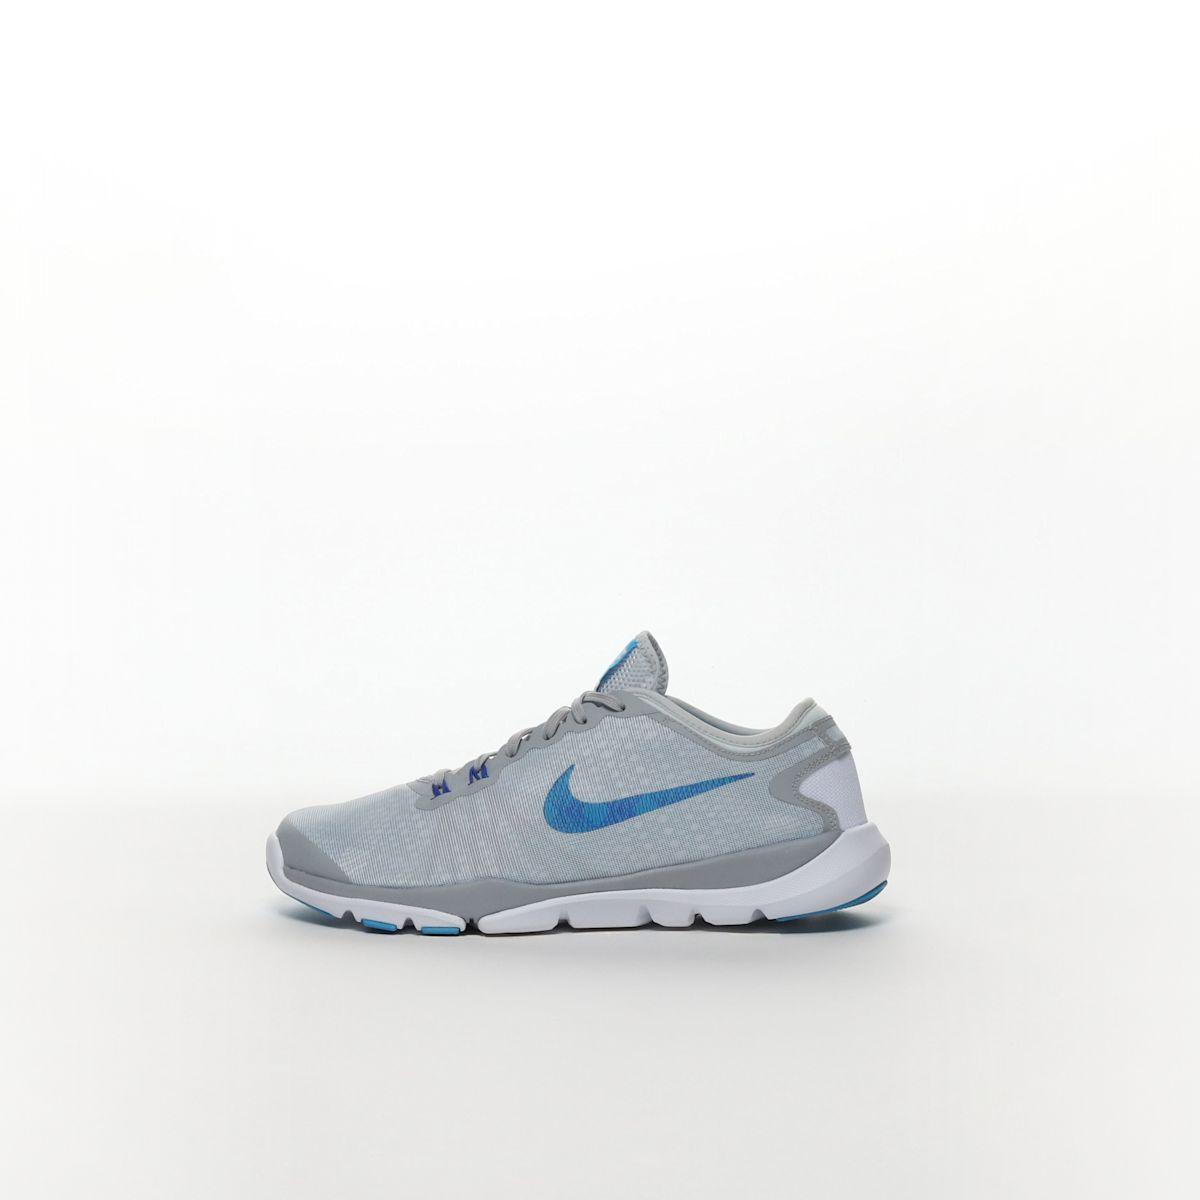 489c008f781e Women s Nike Flex Supreme TR 4 Print Training Shoe - PRPLTM BLGLOW – Resku